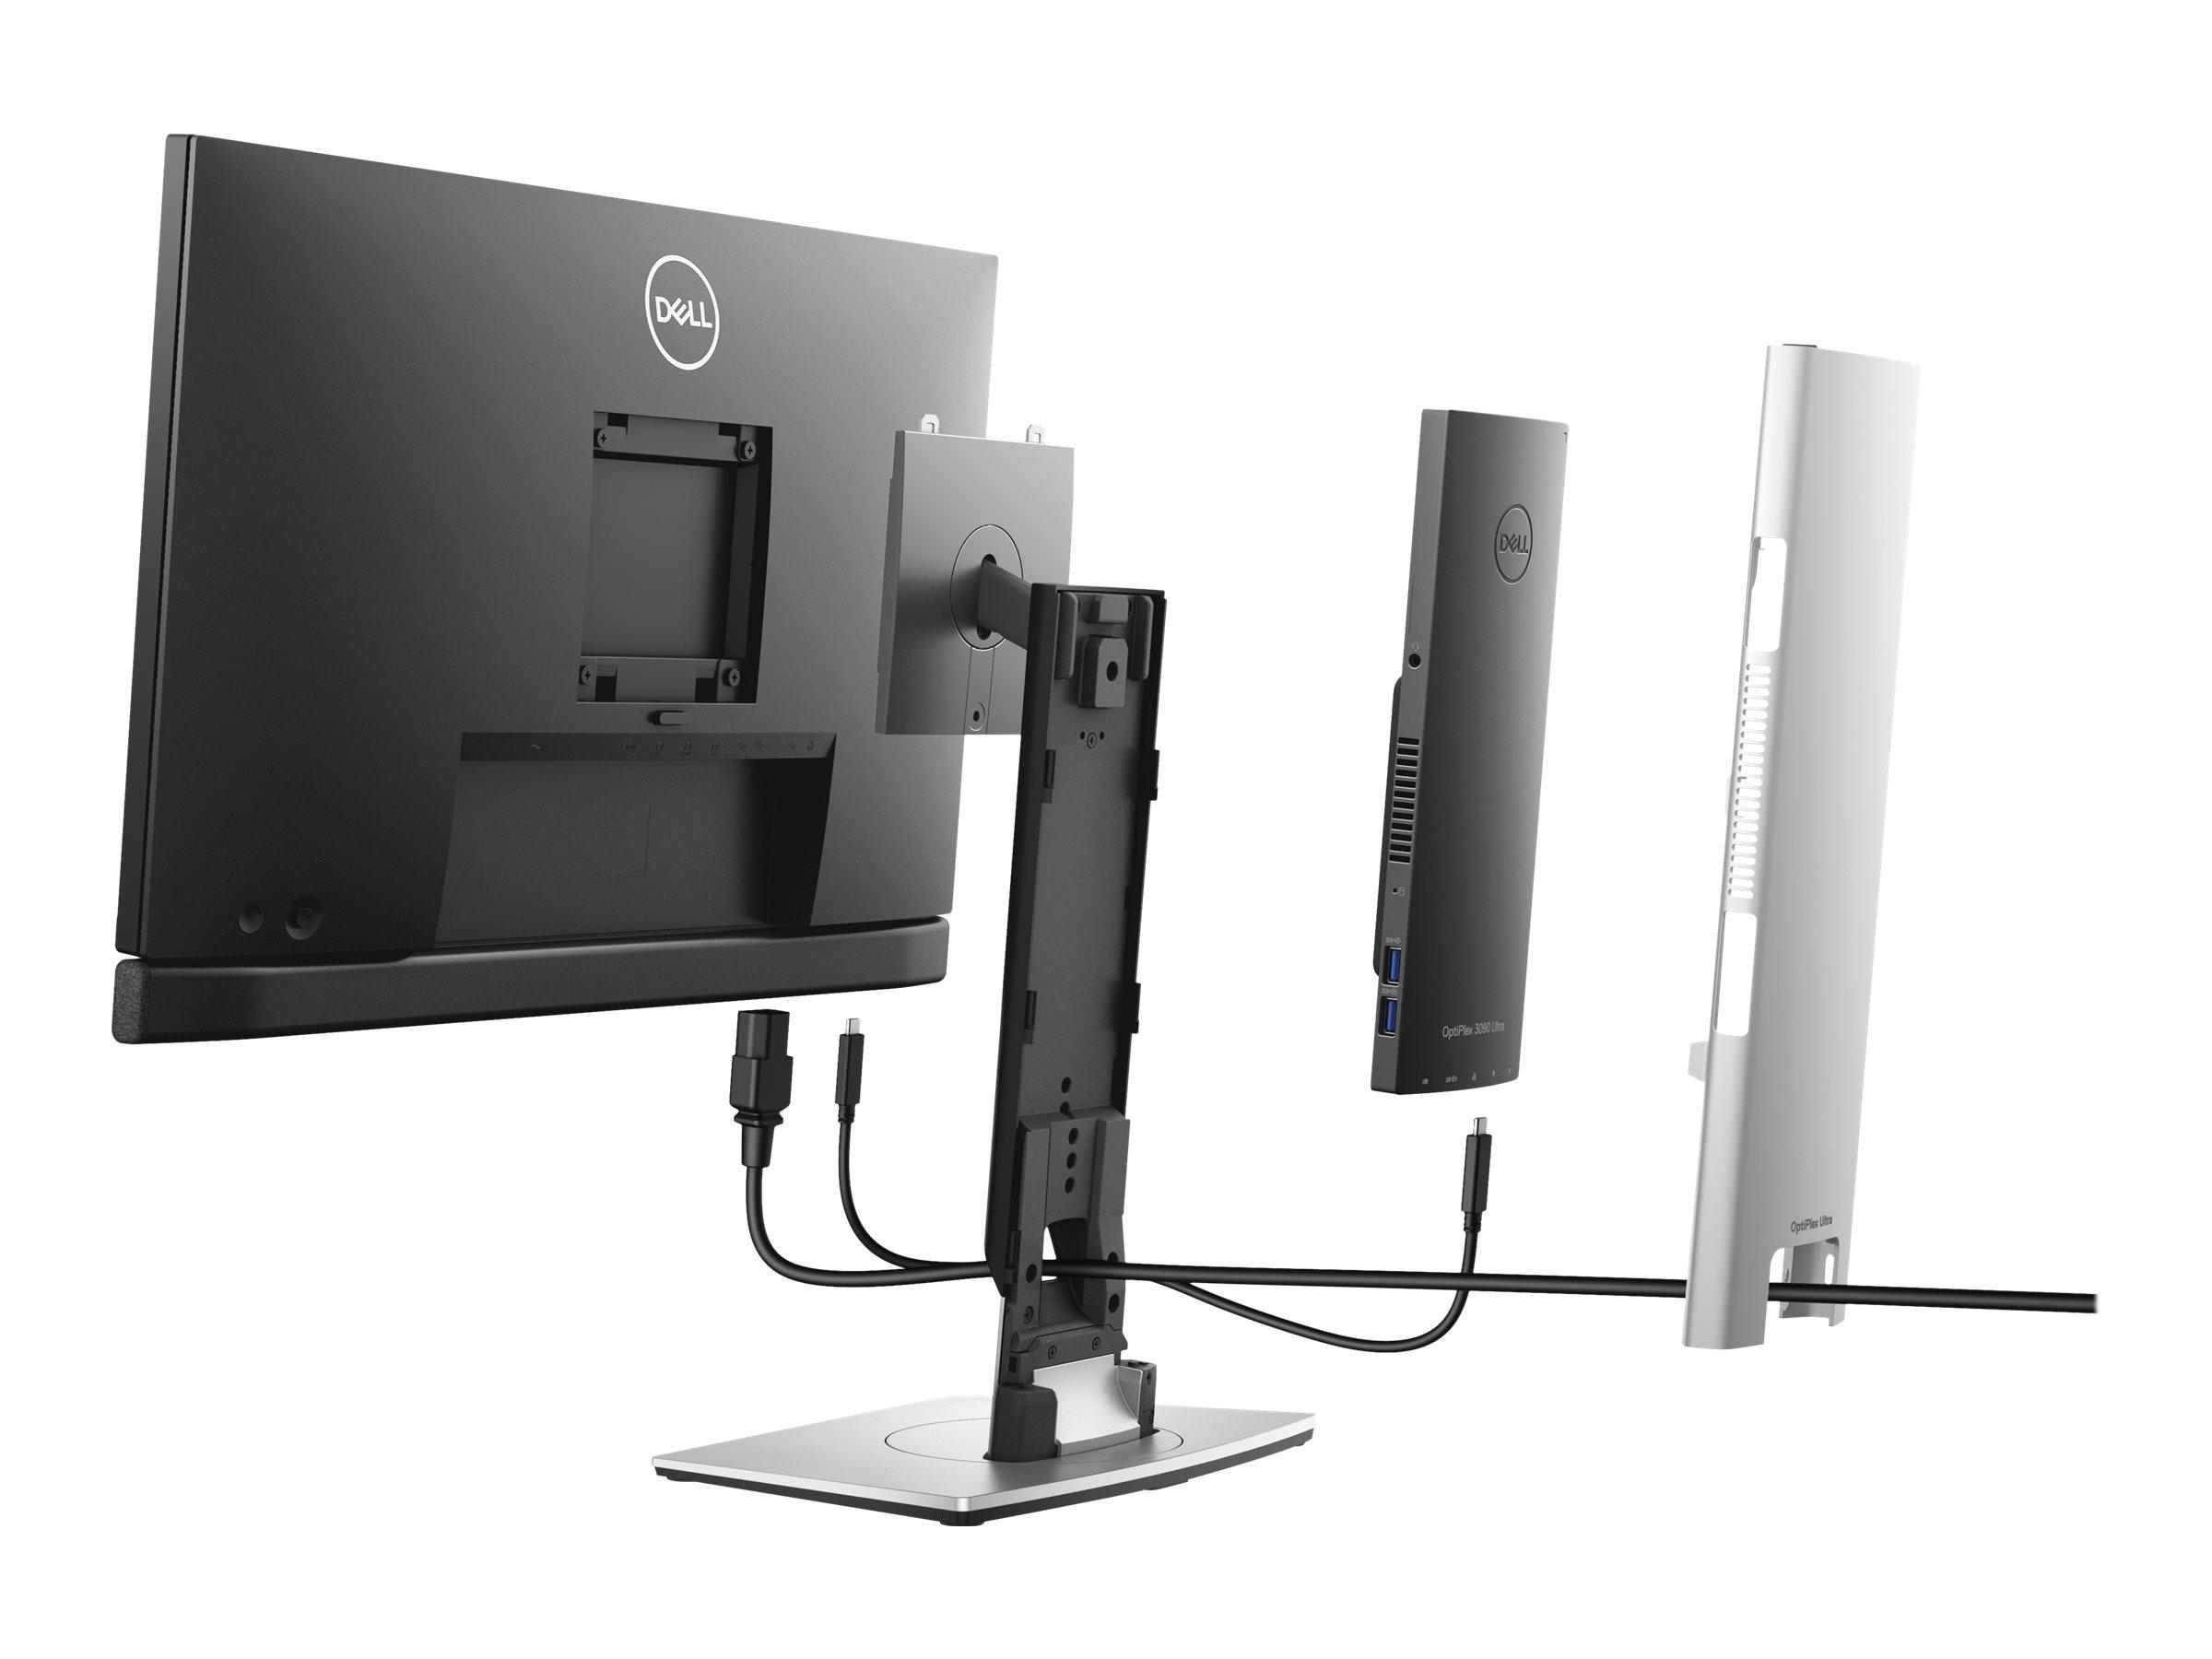 Dell OptiPlex 3090 Ultra - UFF - Core i3 1115G4 / 3 GHz